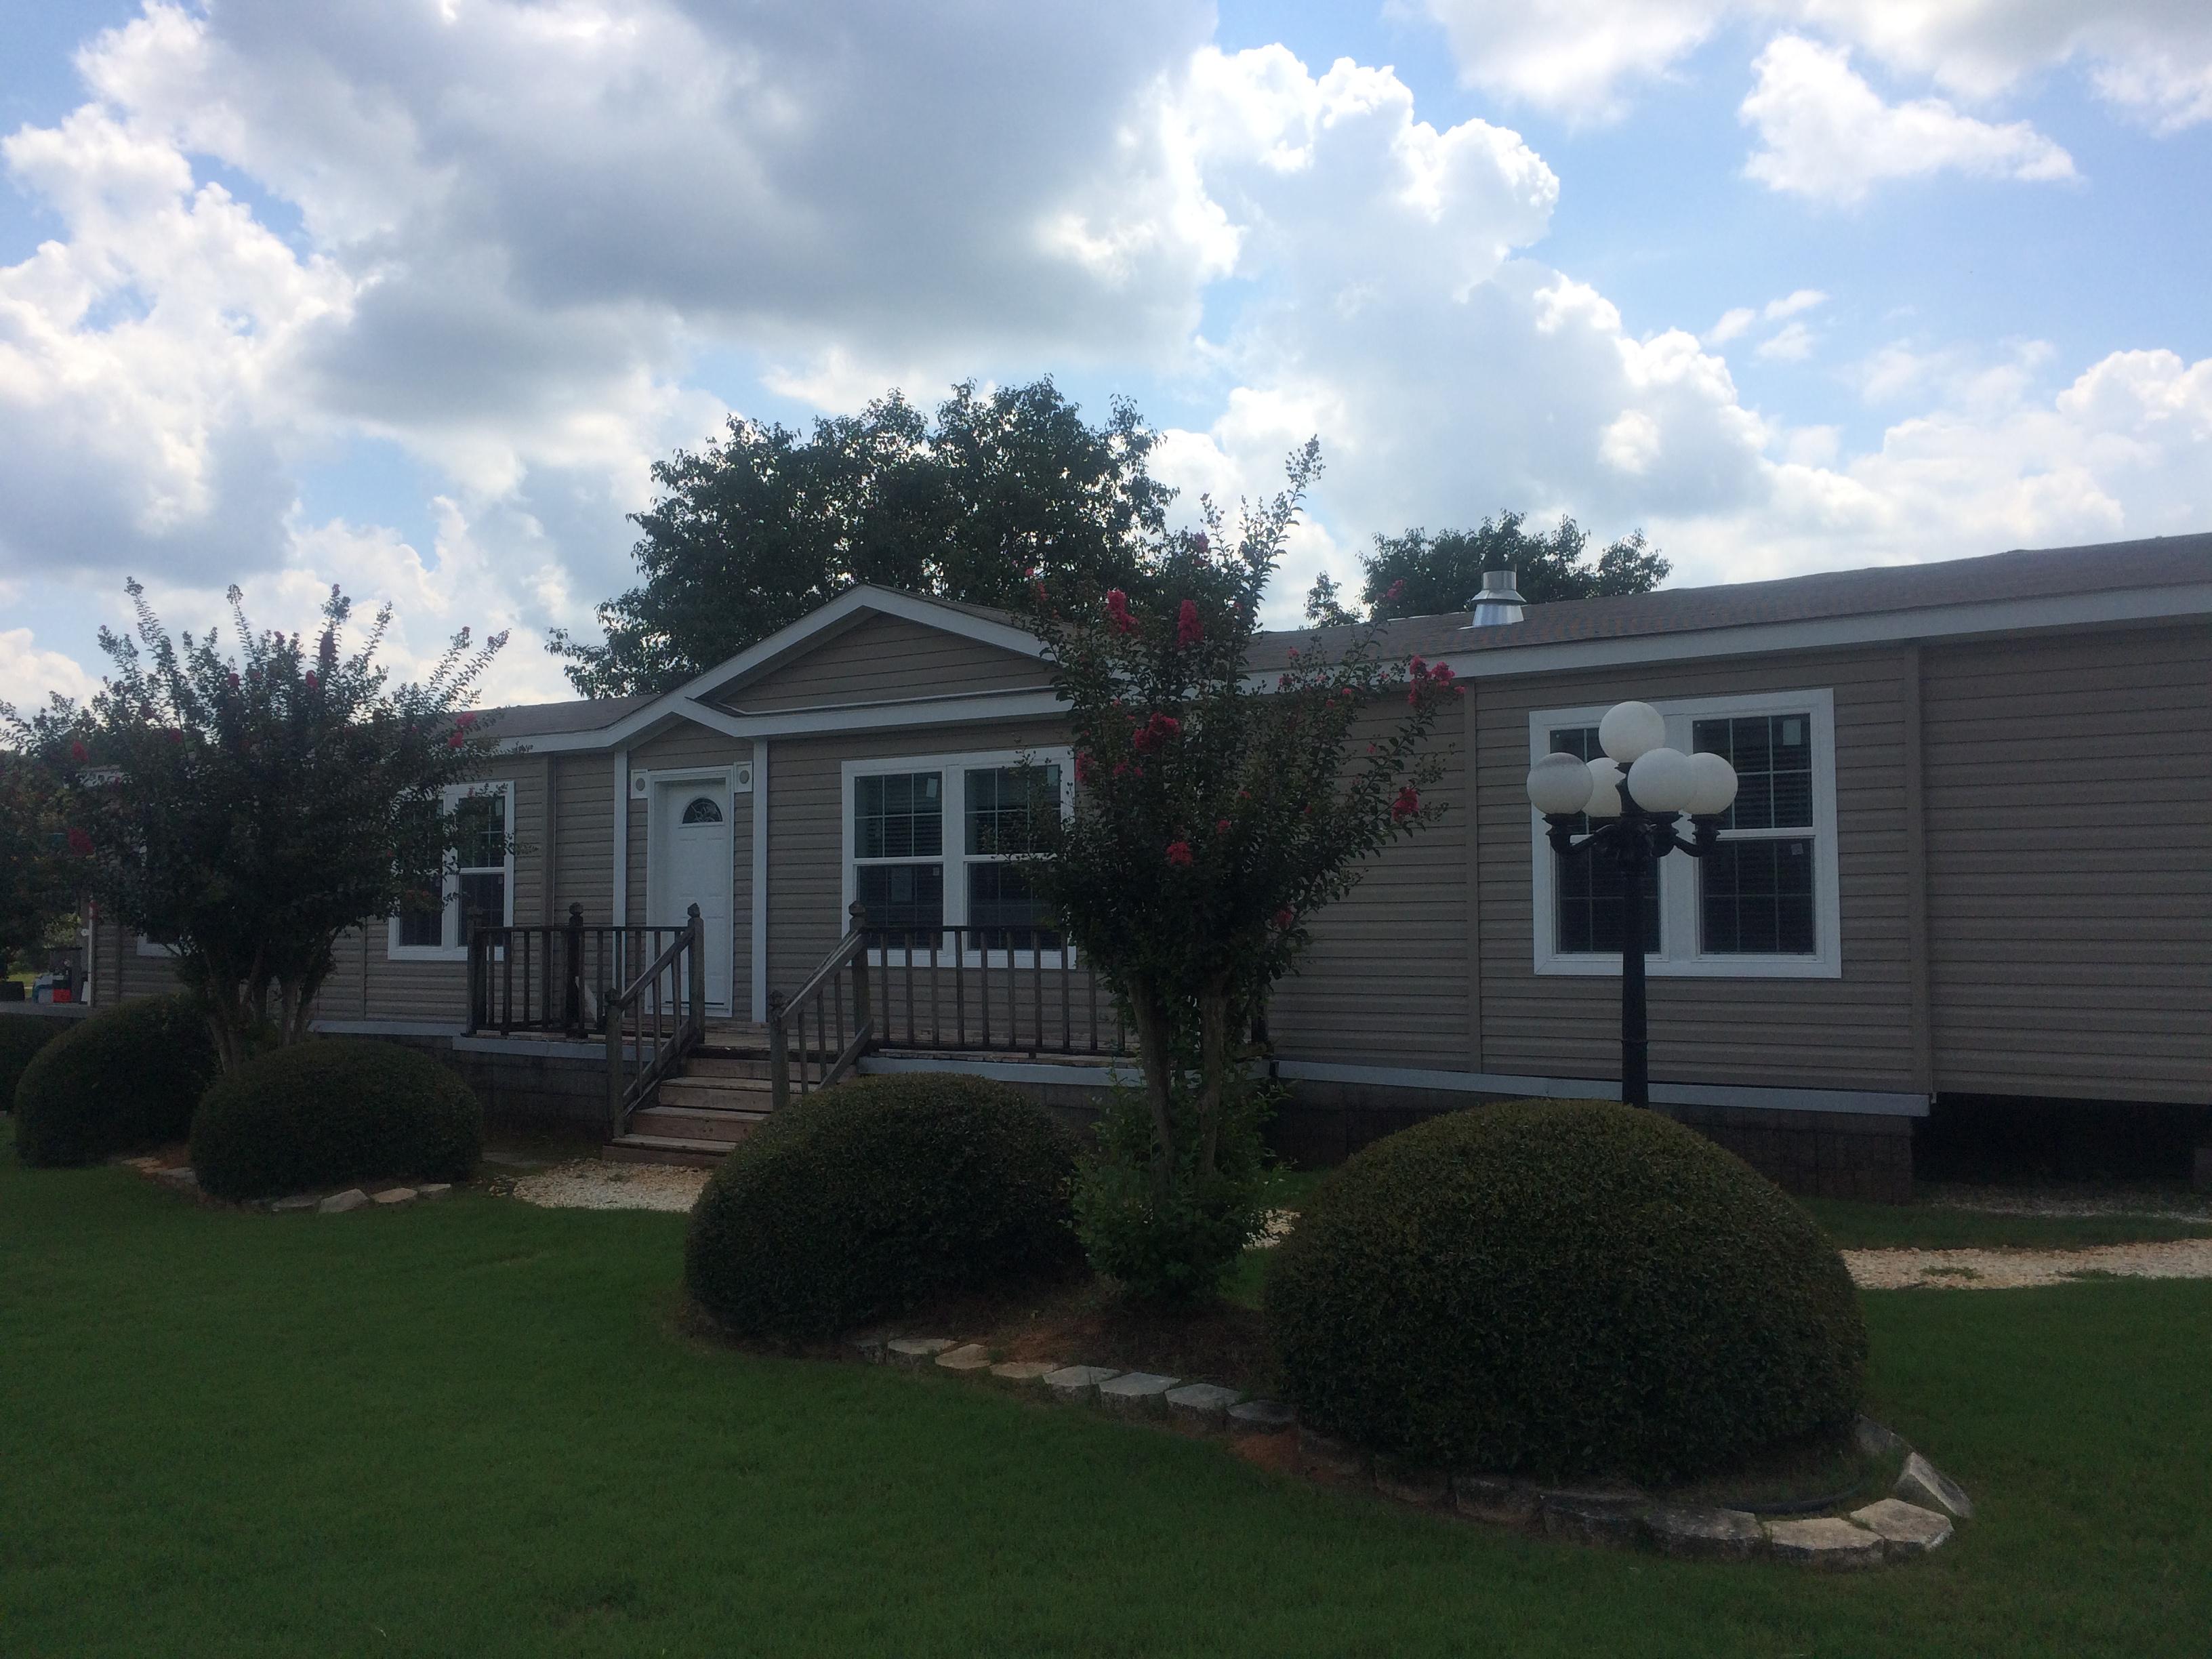 Discount Home Sales on floor plans in oklahoma, largest home in oklahoma, trailer houses in oklahoma, manufactured homes in oklahoma, forest homes in oklahoma,